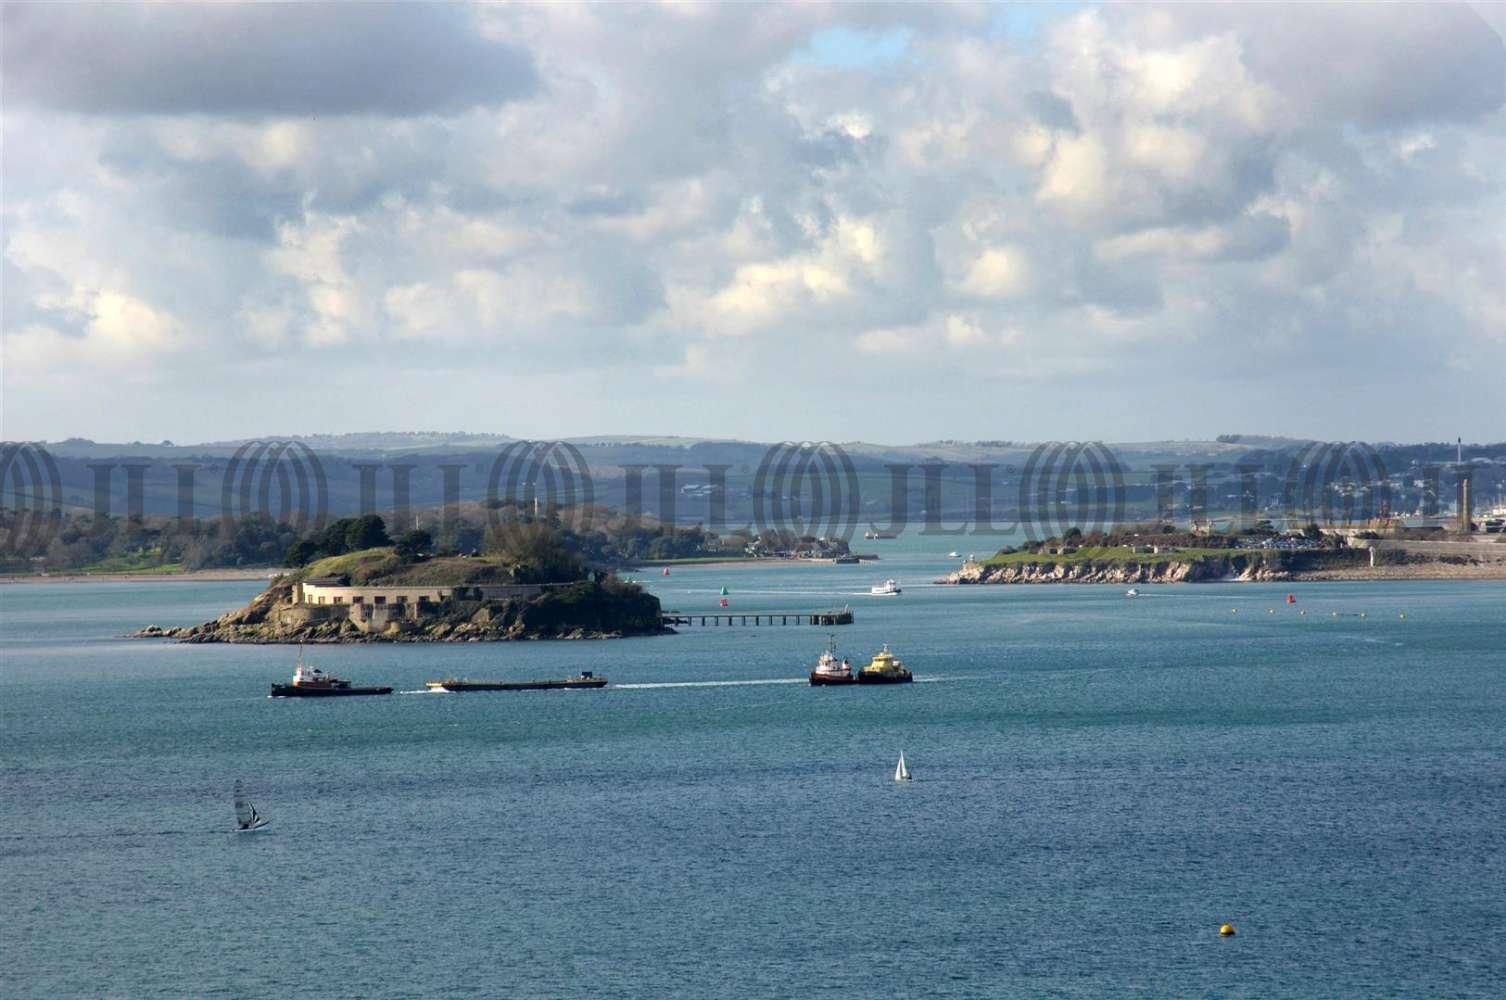 Land Plymouth, PL9 9RE - Drake's Island